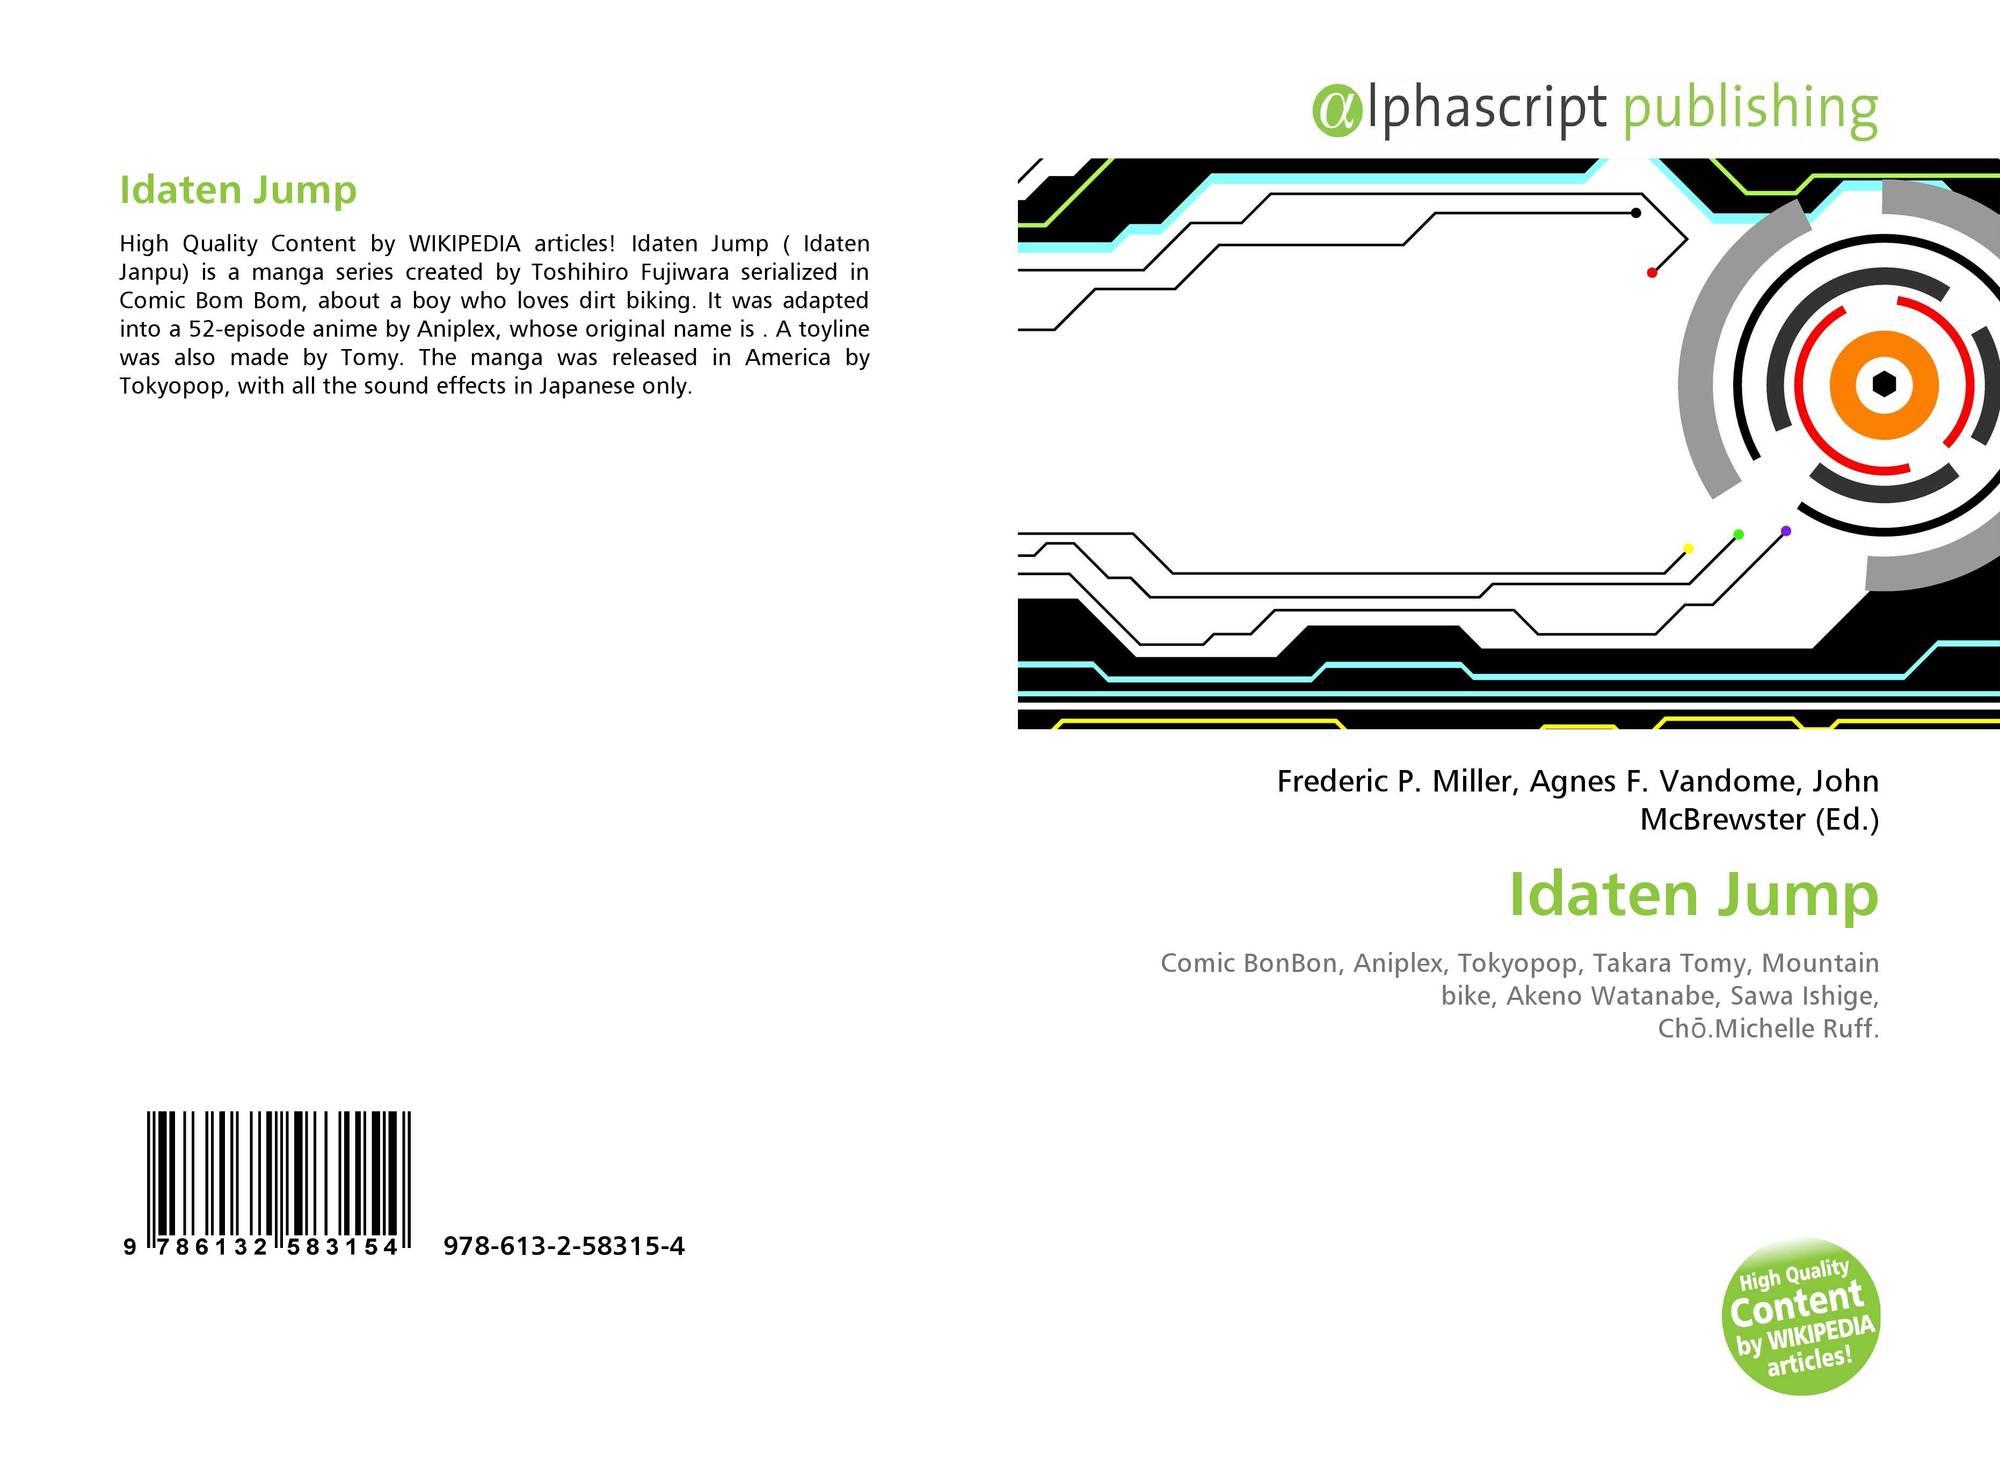 Idaten Jump, 978-613-2-58315-4, 6132583157 ,9786132583154